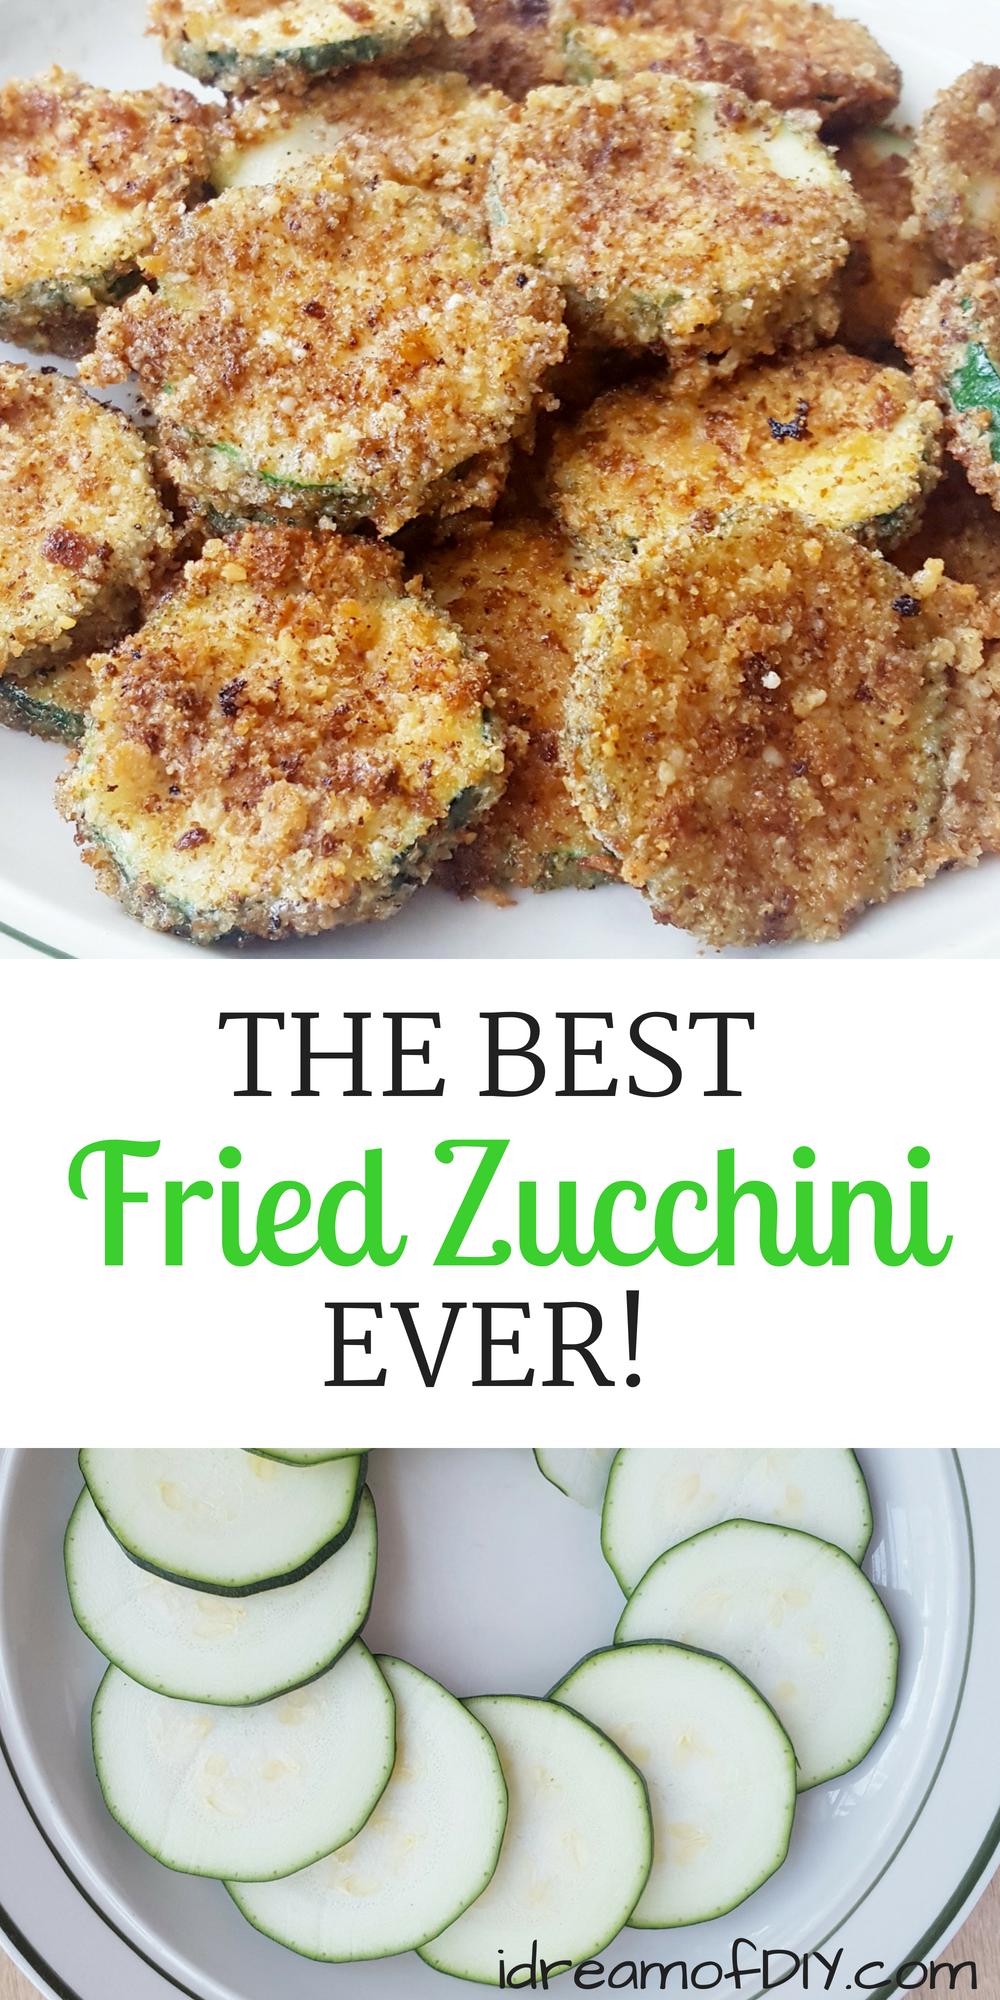 Photo of The Best Fried Zucchini Recipe Ever